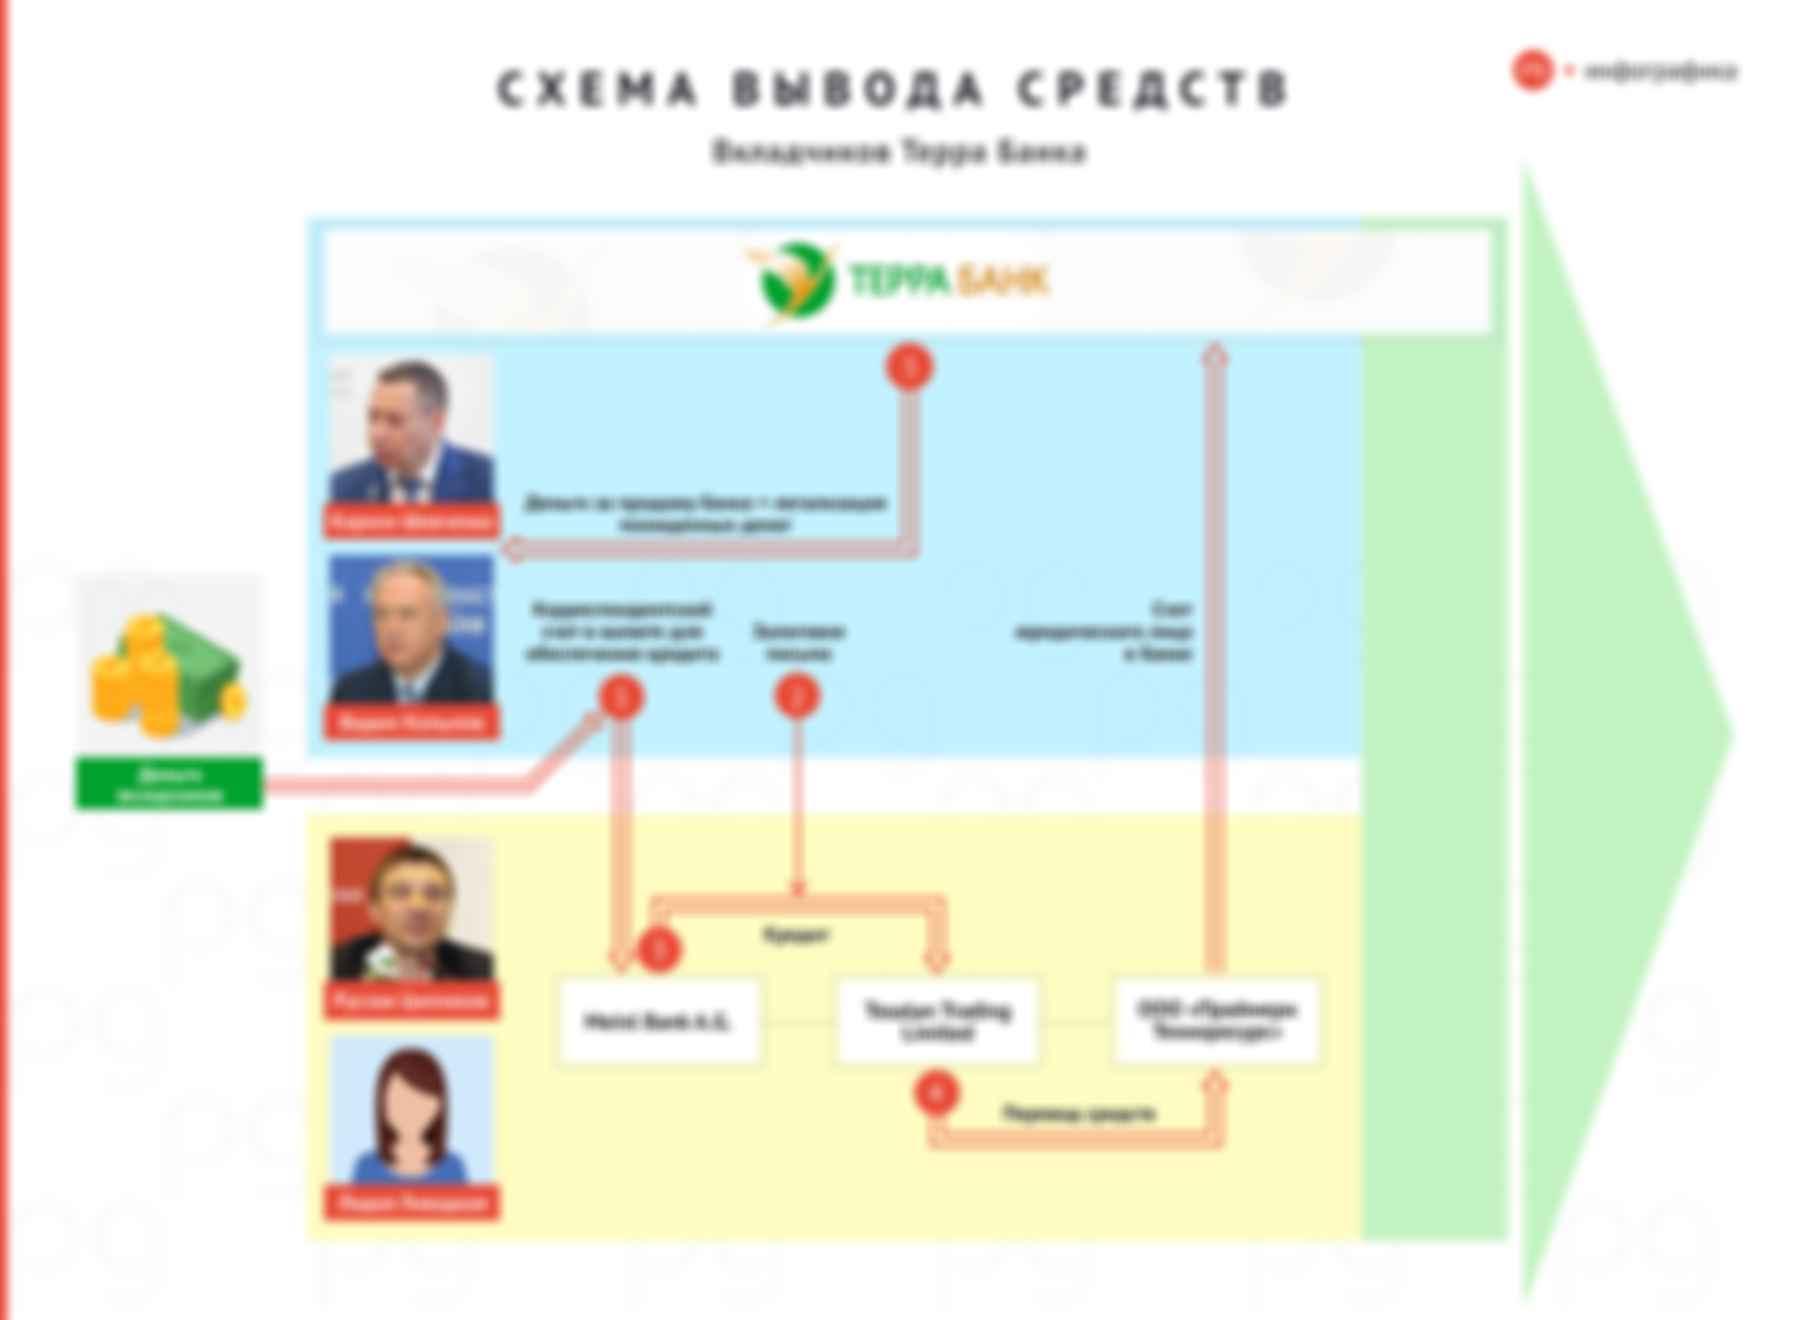 Схема вывода средств вкладчиков Терра Банка. Инфографика: The Page